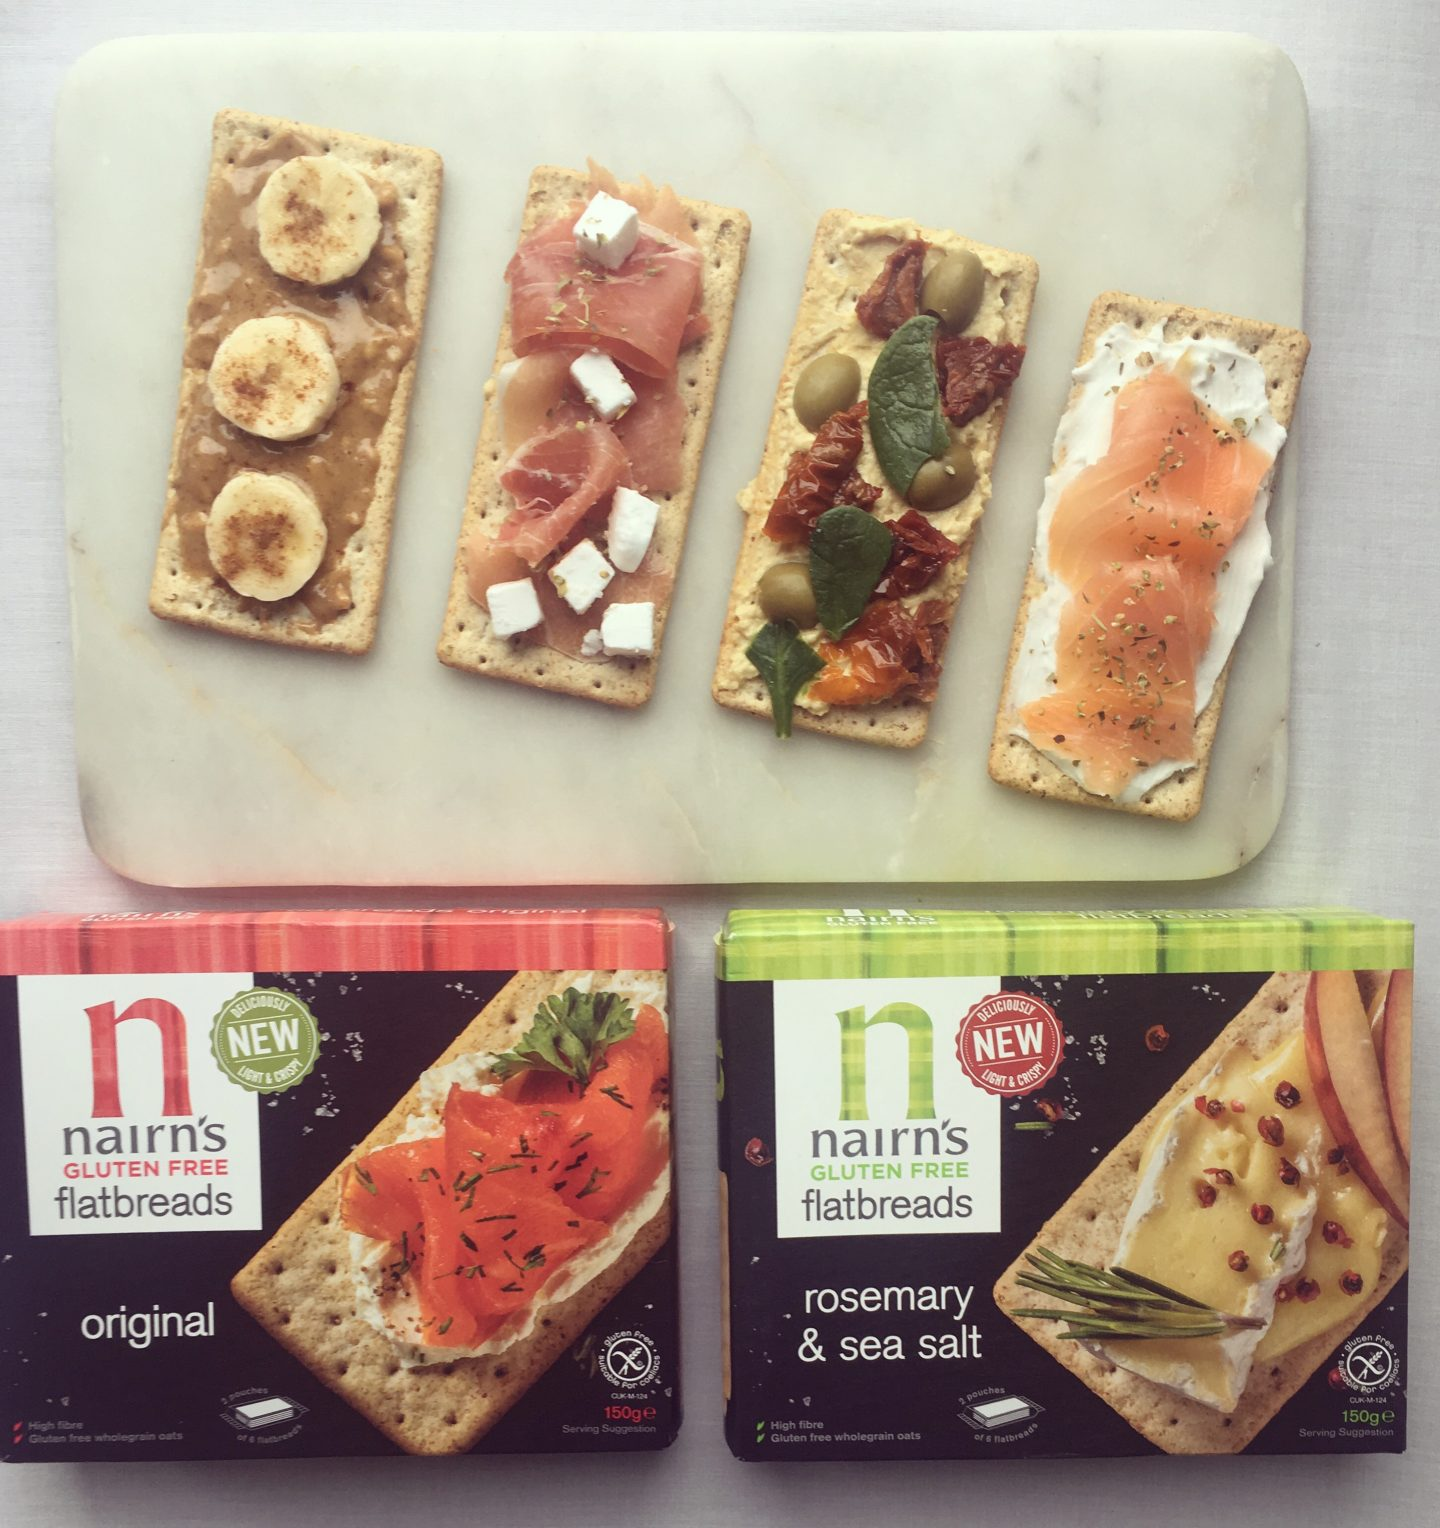 New gluten free goodies by Nairn's